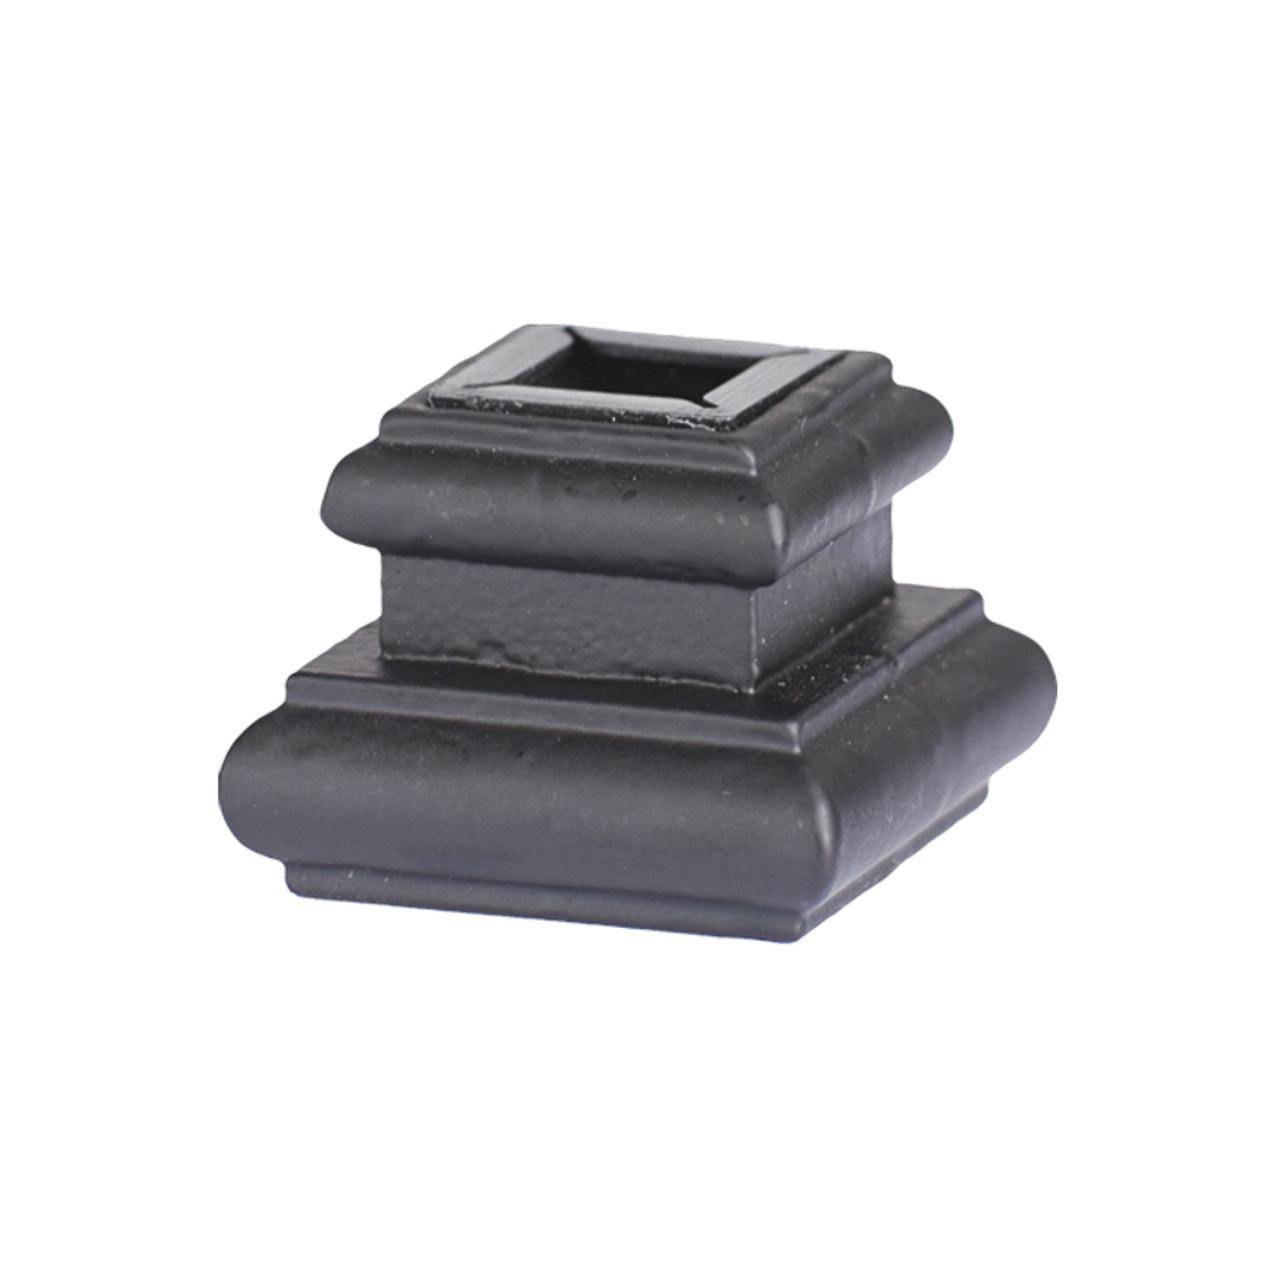 HF16.3.44 Adjustable Small Solid Iron Flat Shoe